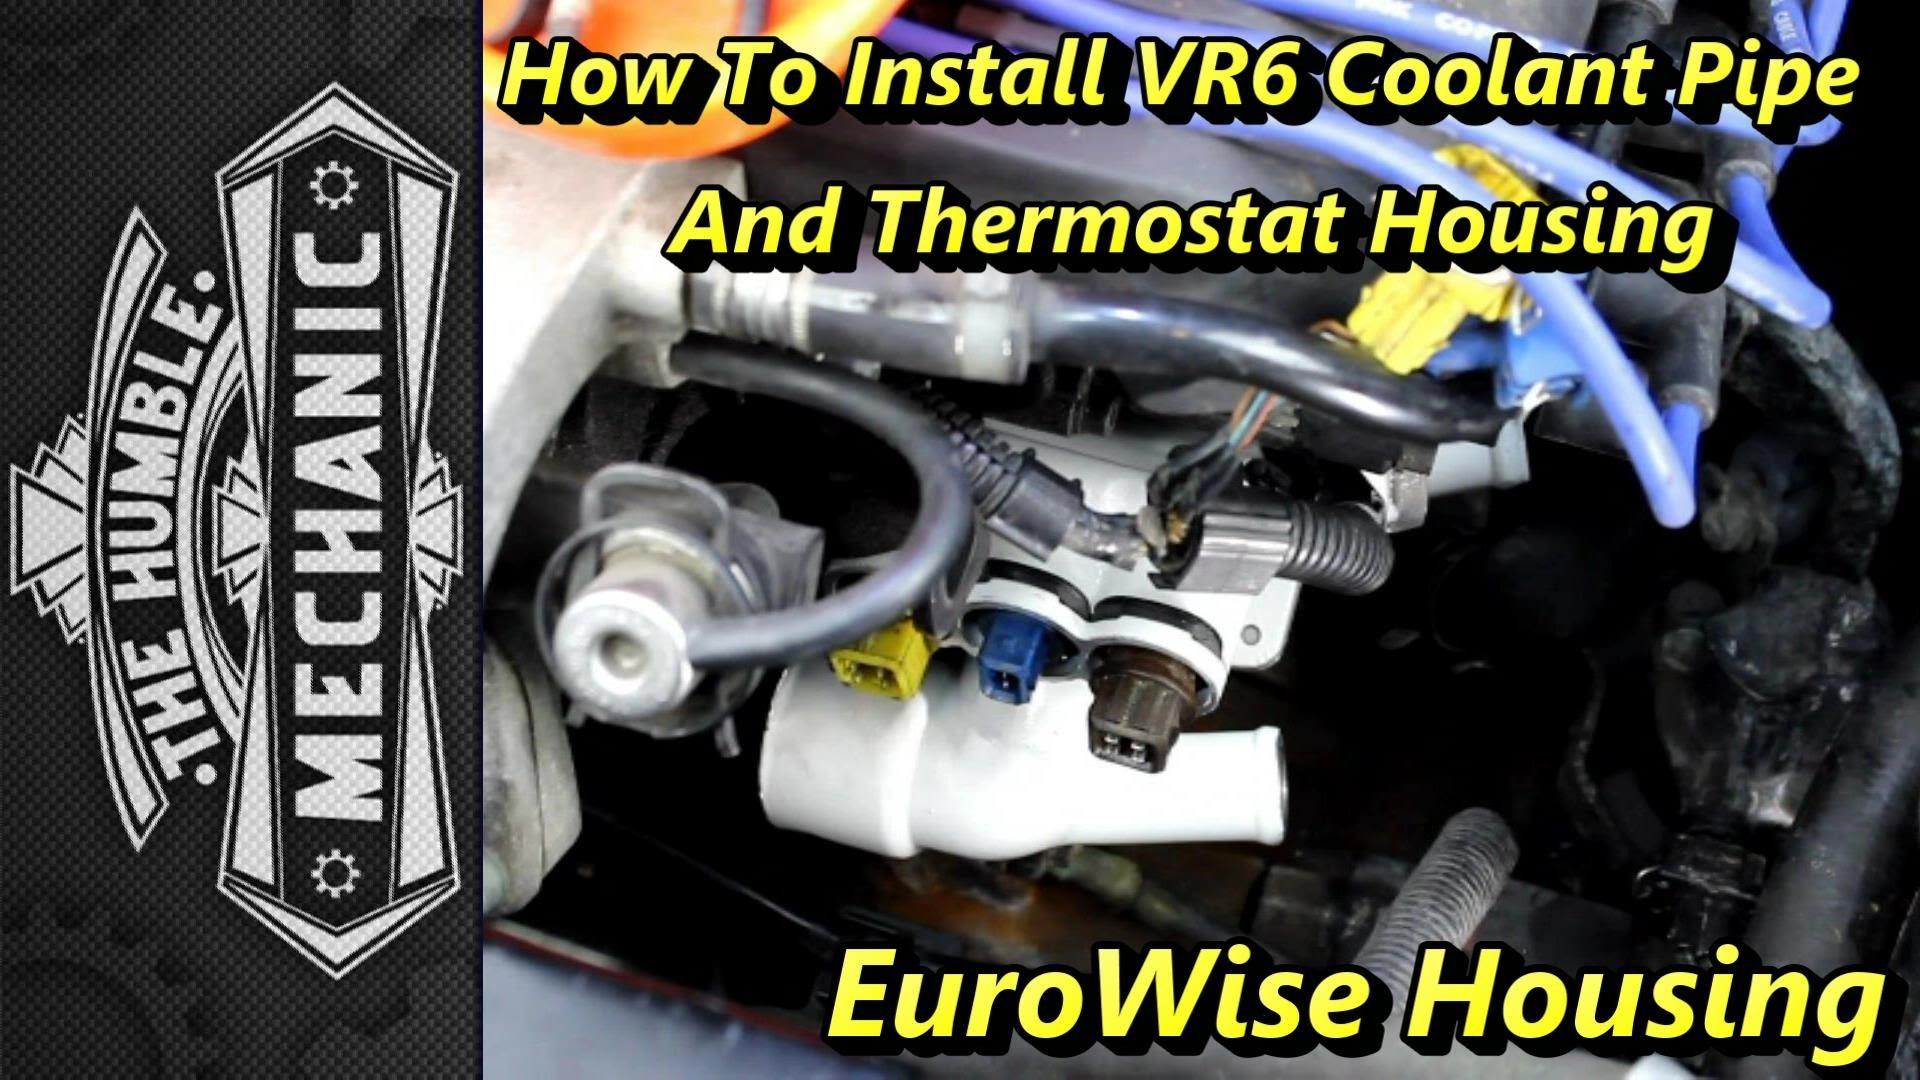 hight resolution of 1996 vw jetta engine wiring diagrams u2022 wiring diagram for free 1999 vw jetta engine diagram vw w8 engine